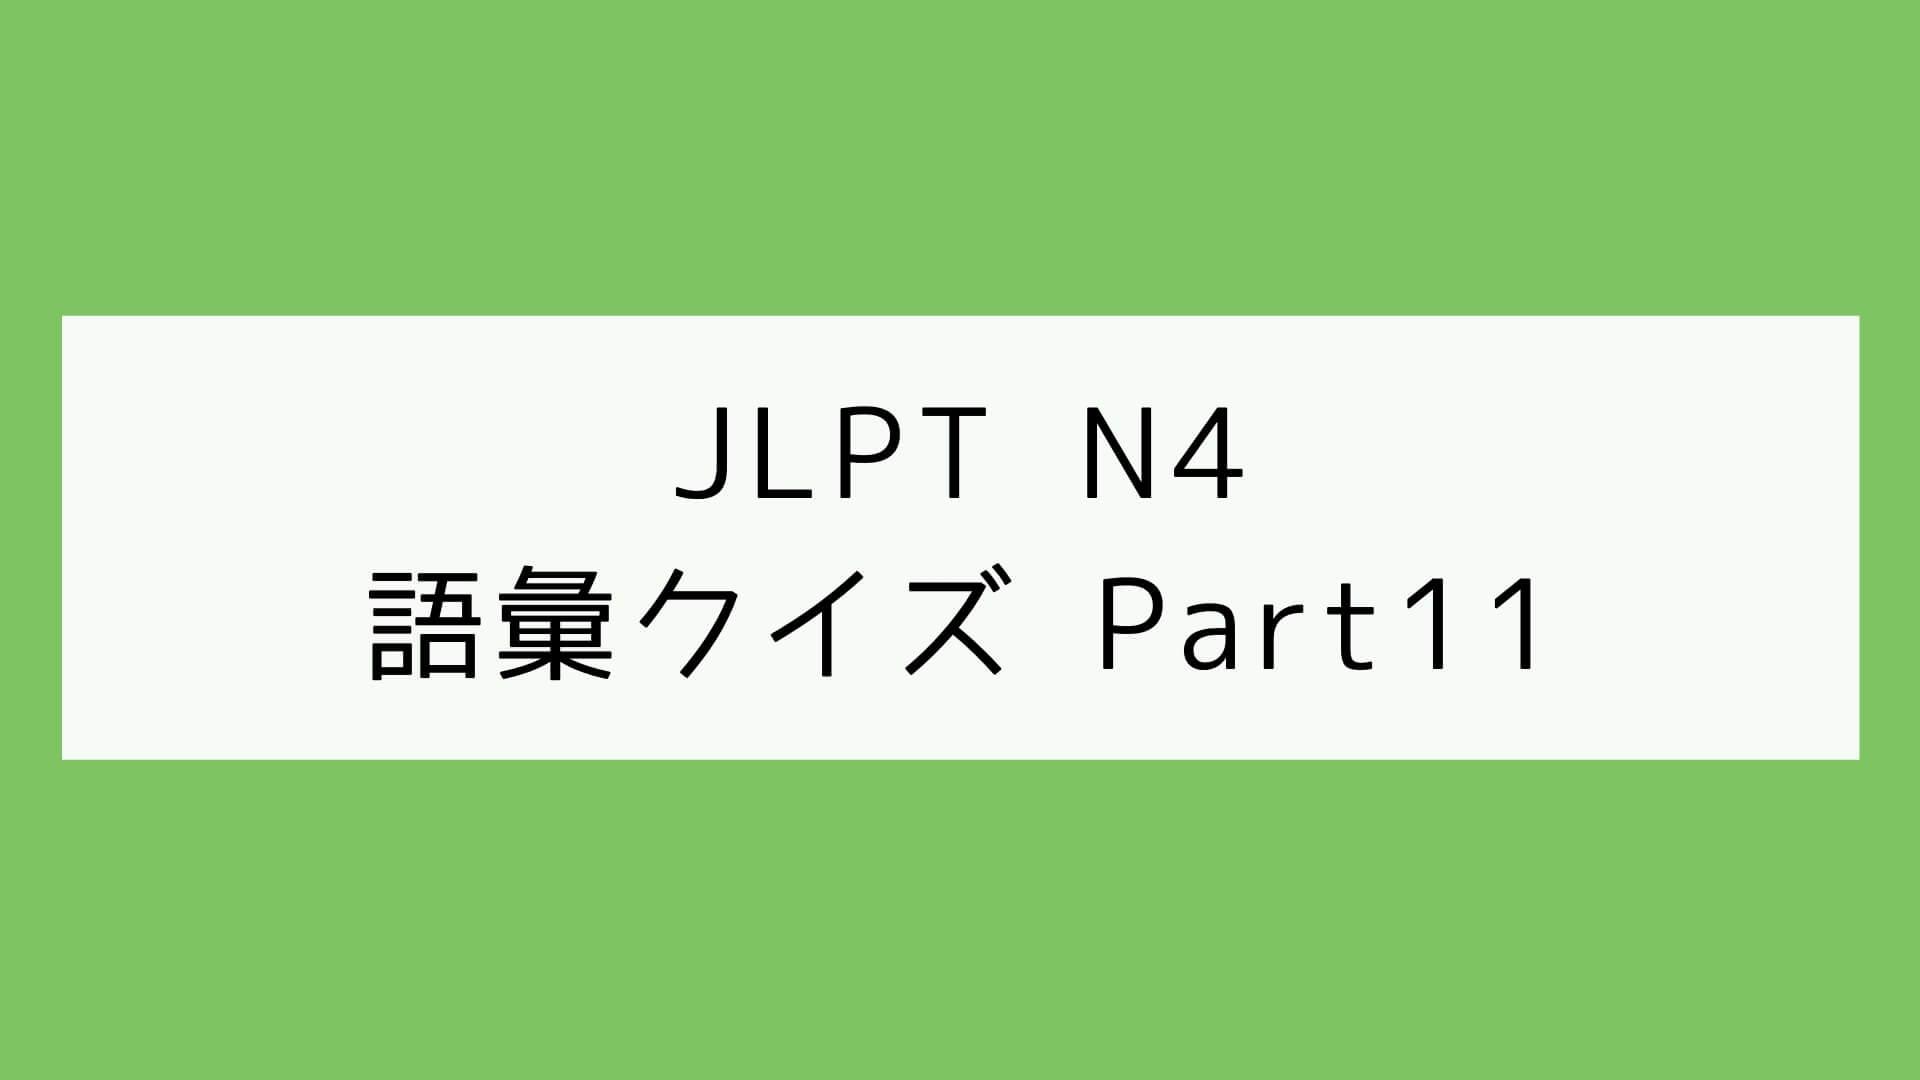 【JLPT N4】語彙クイズ Part11